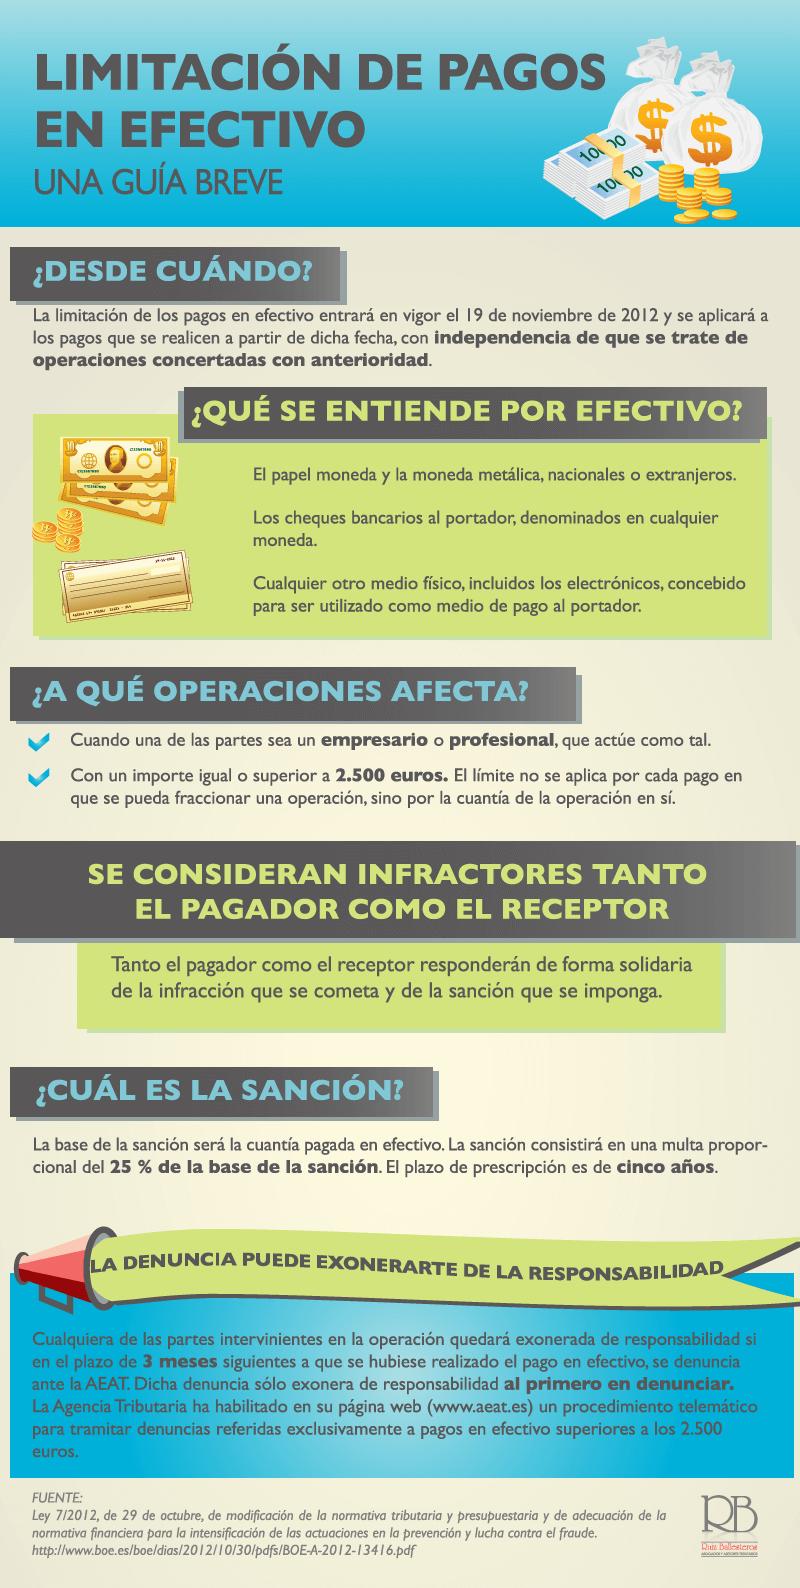 limitacion pagos efectivo infografia